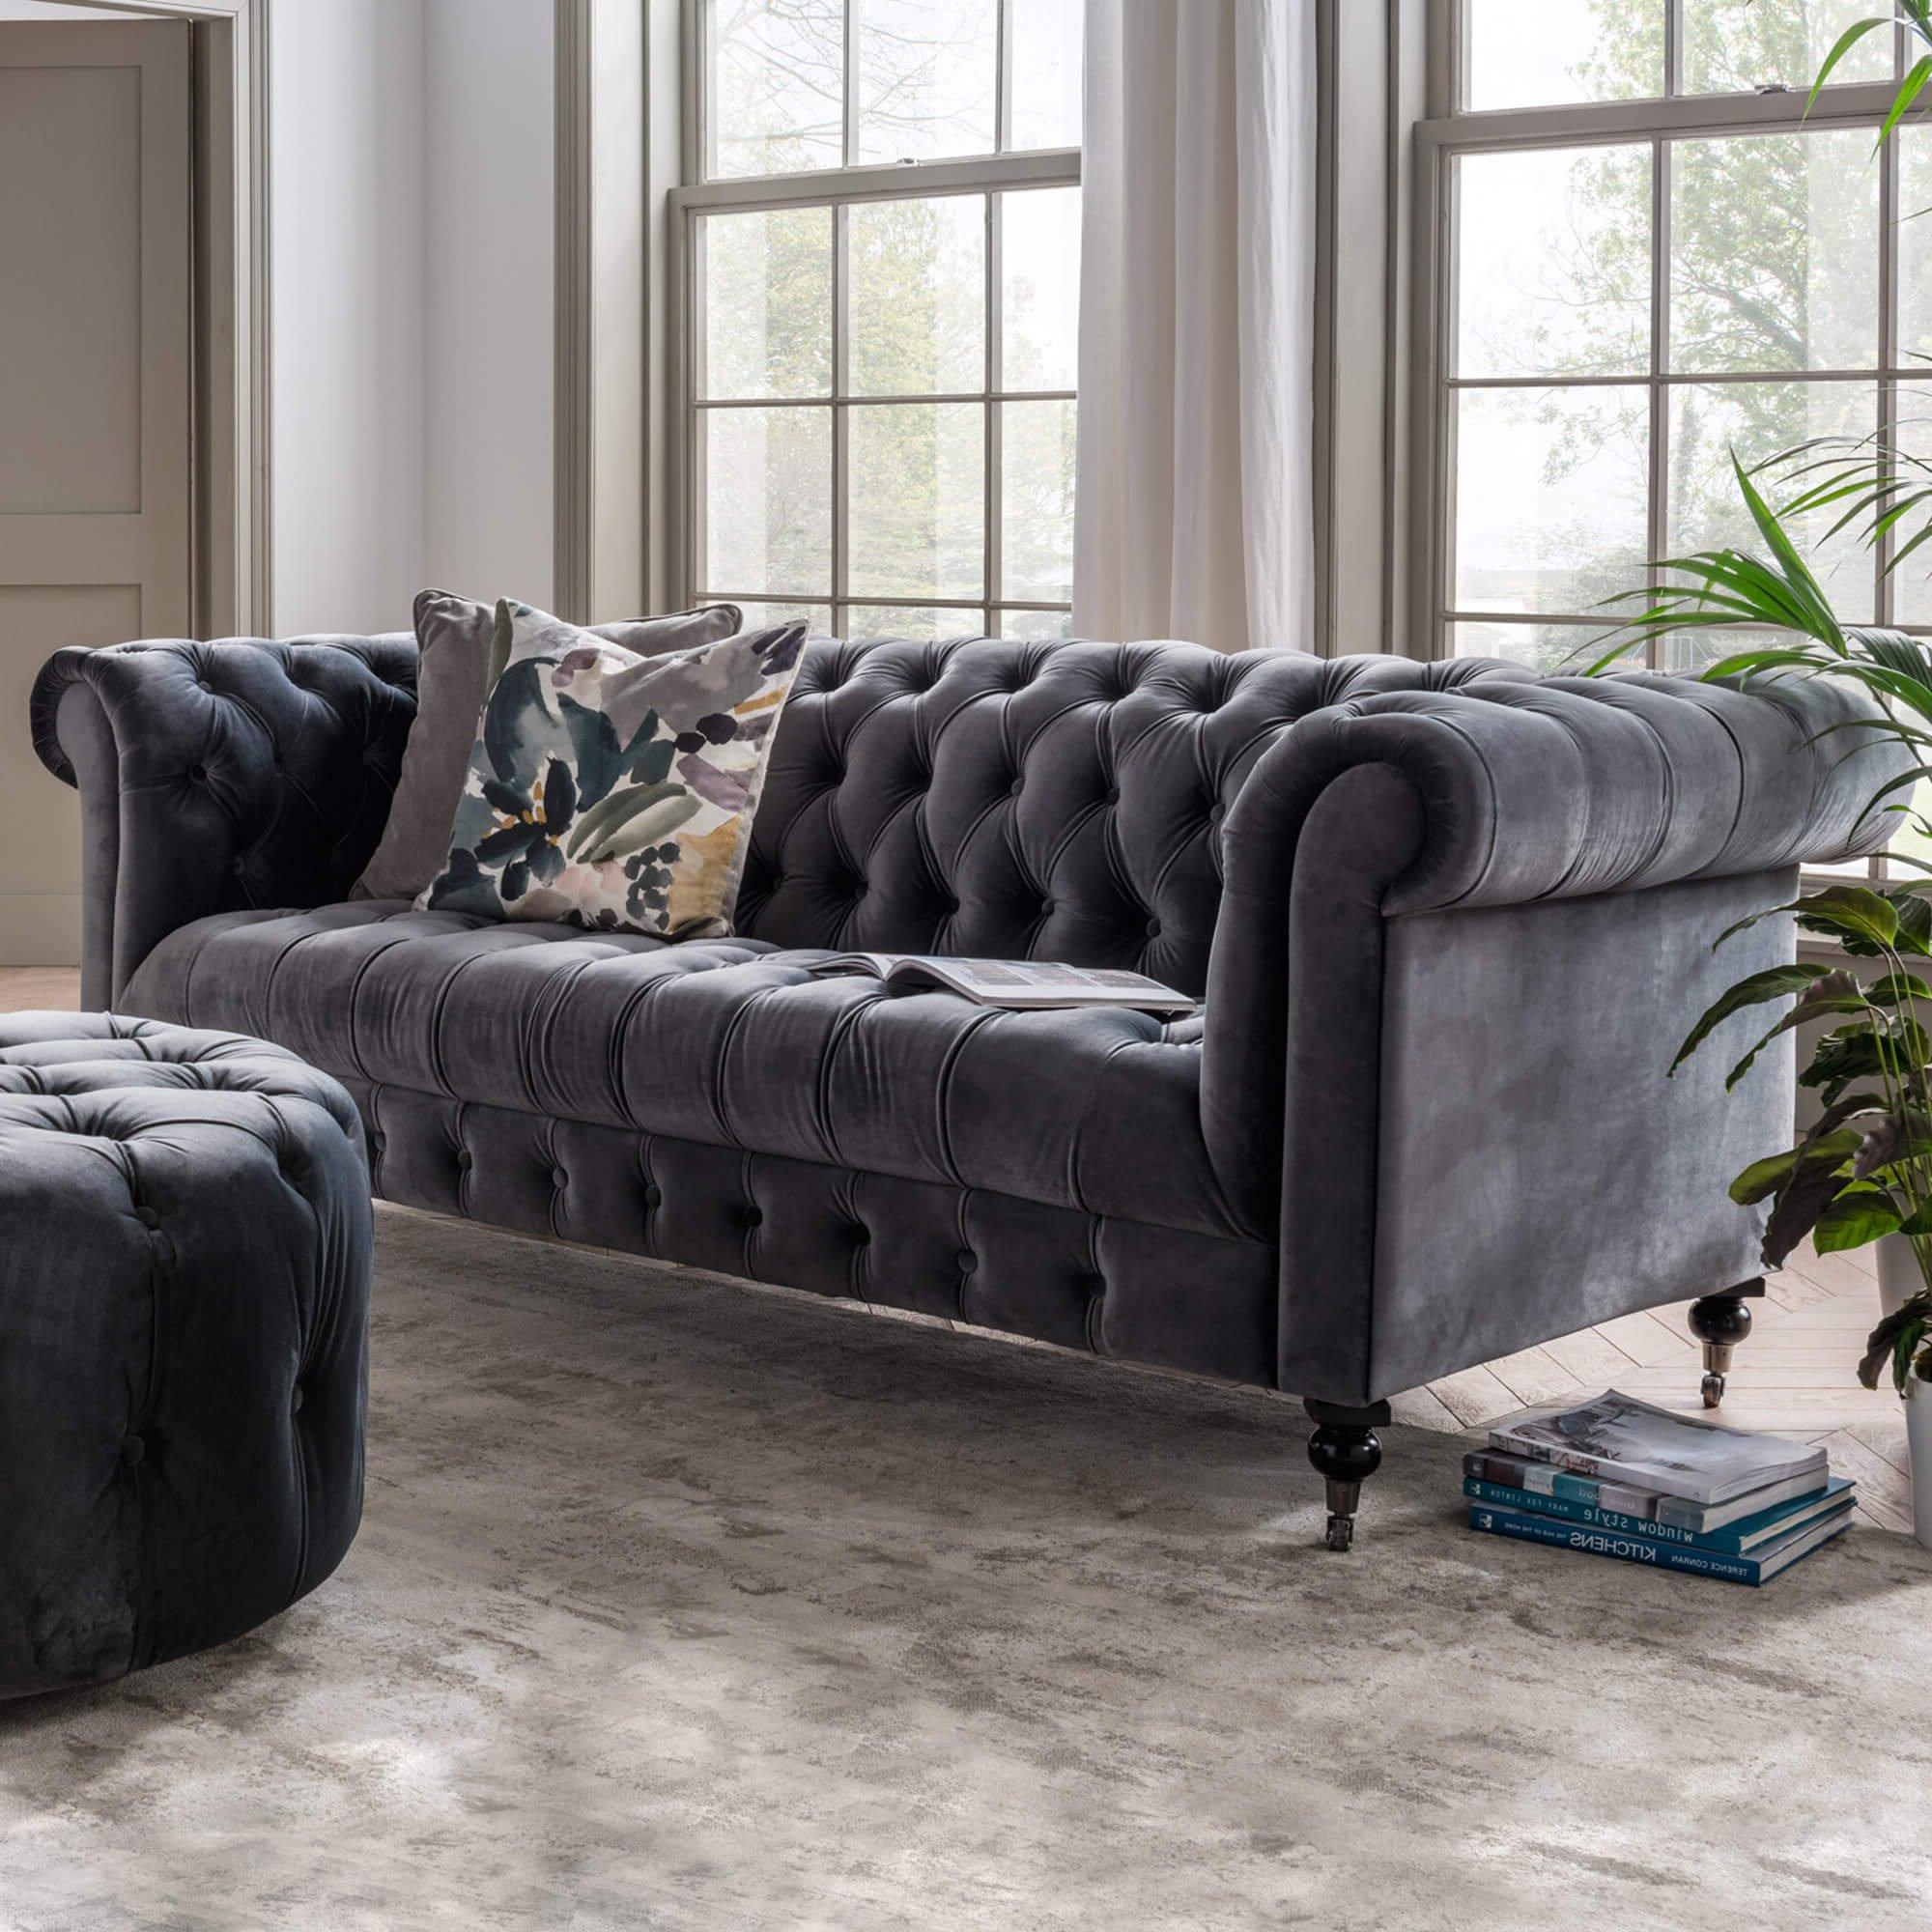 Newest Windsor Grey Velvet 3 Seater Sofa For Gray Sofas (View 1 of 15)